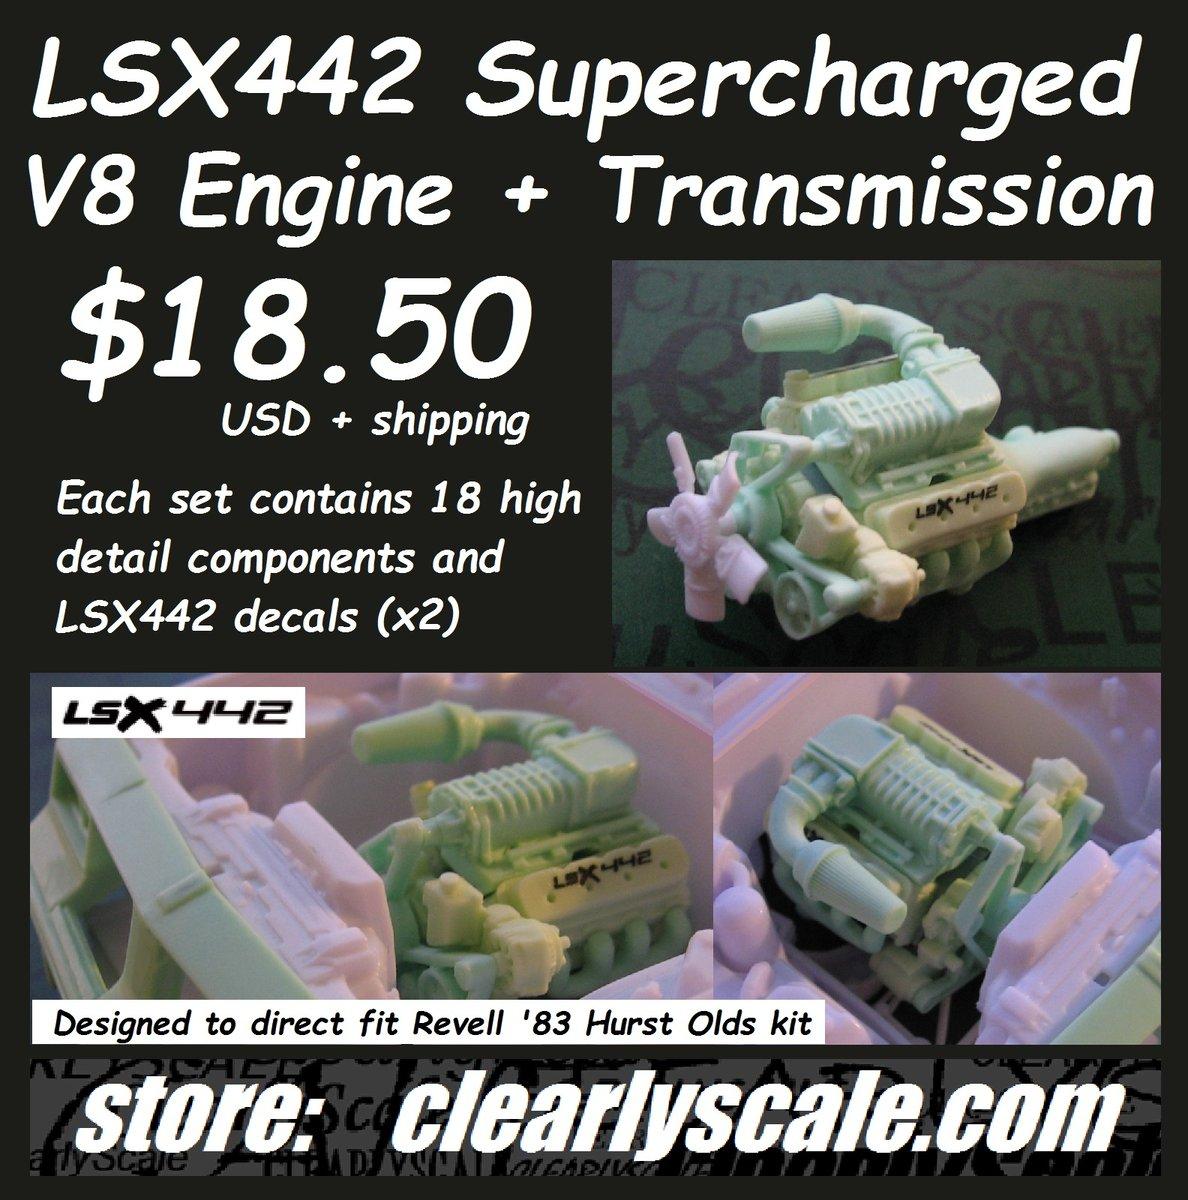 Oldsmobile Supercharger Kits: LSX442 Supercharged V8 Engine Set (for Revell '83 Hurst